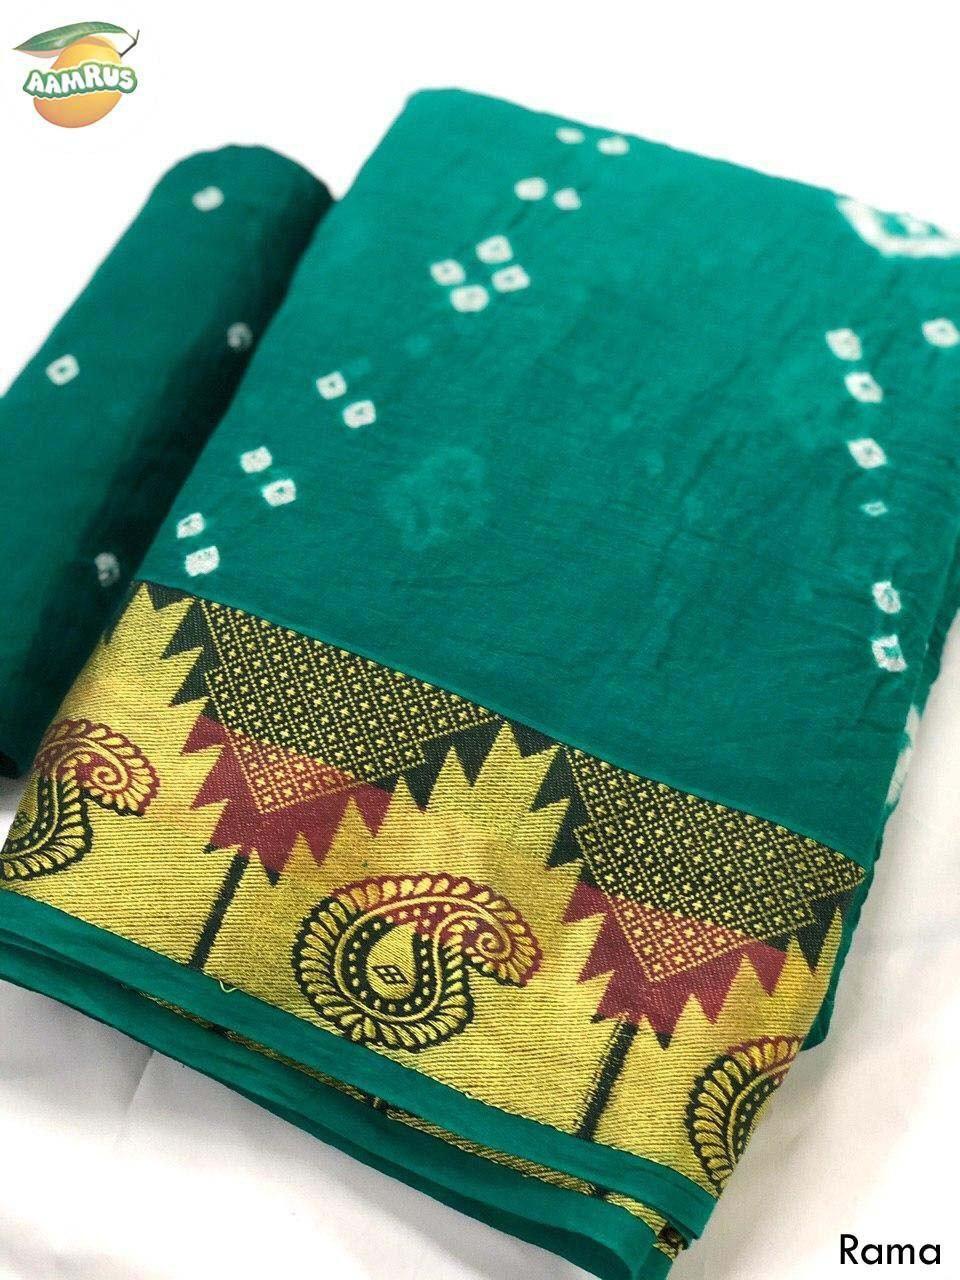 Ssm-Aamrus-Pure-Cotton-Saree-8